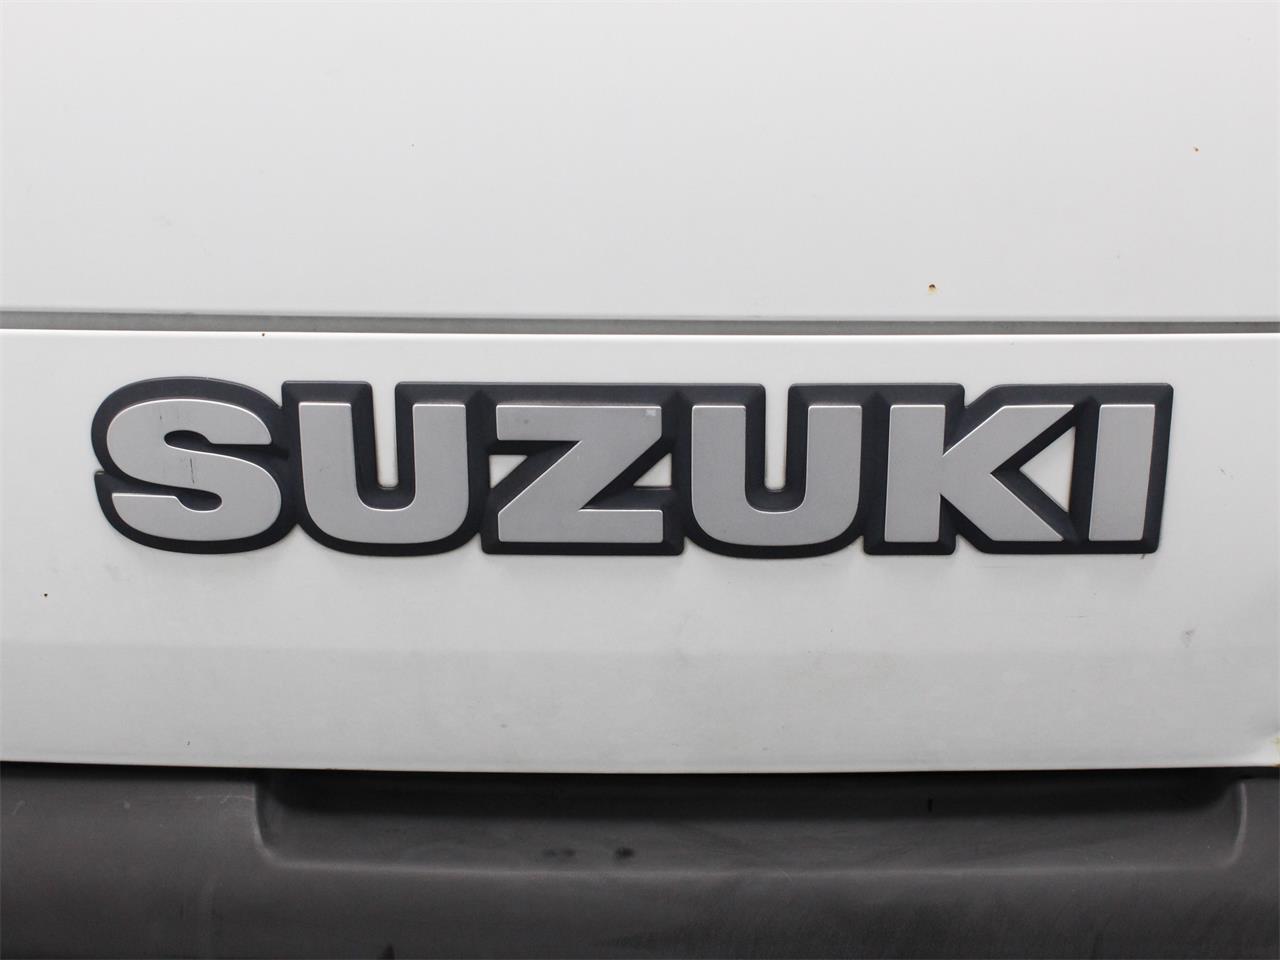 1993 Suzuki Carry (CC-1310606) for sale in Christiansburg, Virginia